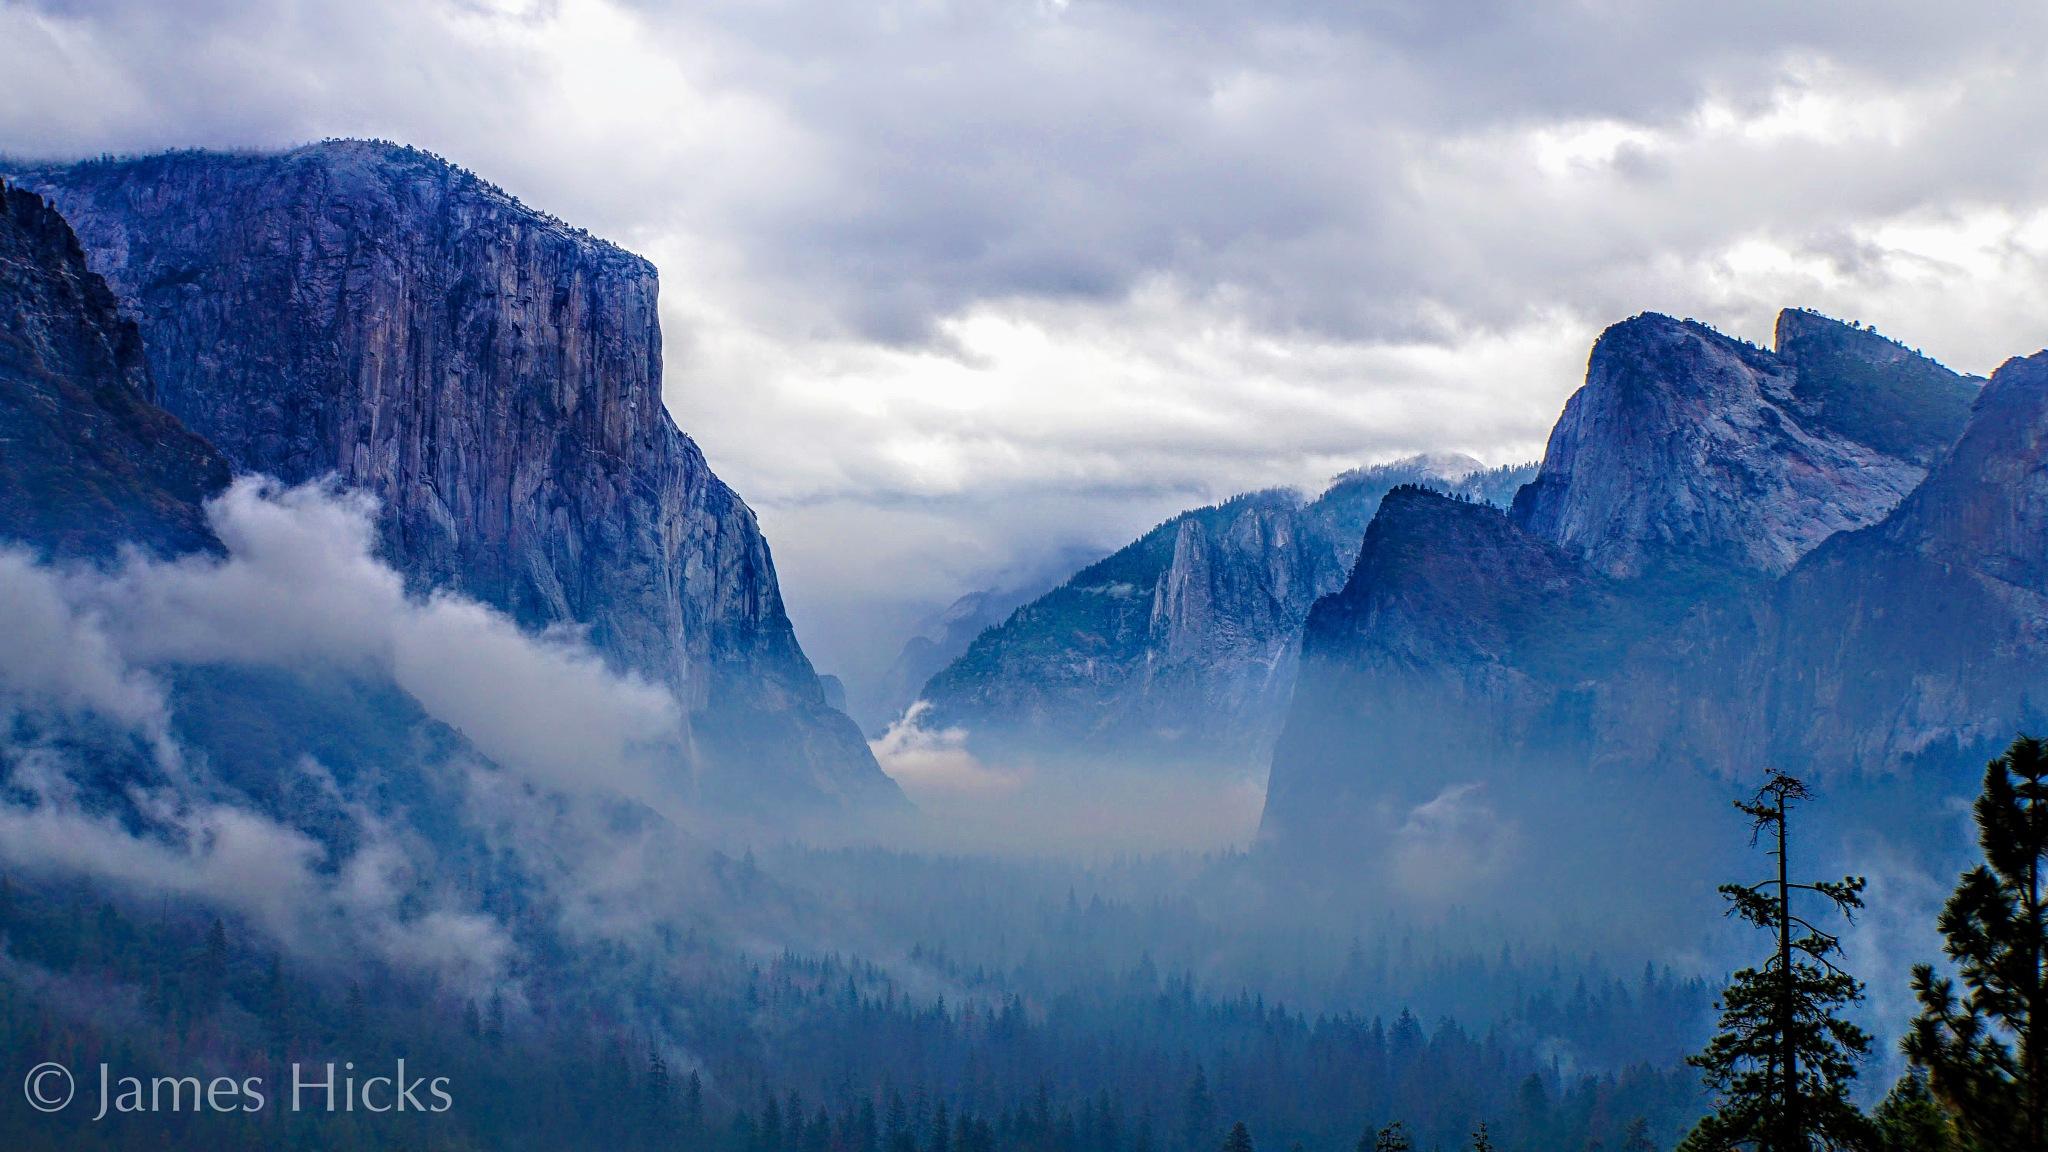 Yosemite Valley by James Hicks